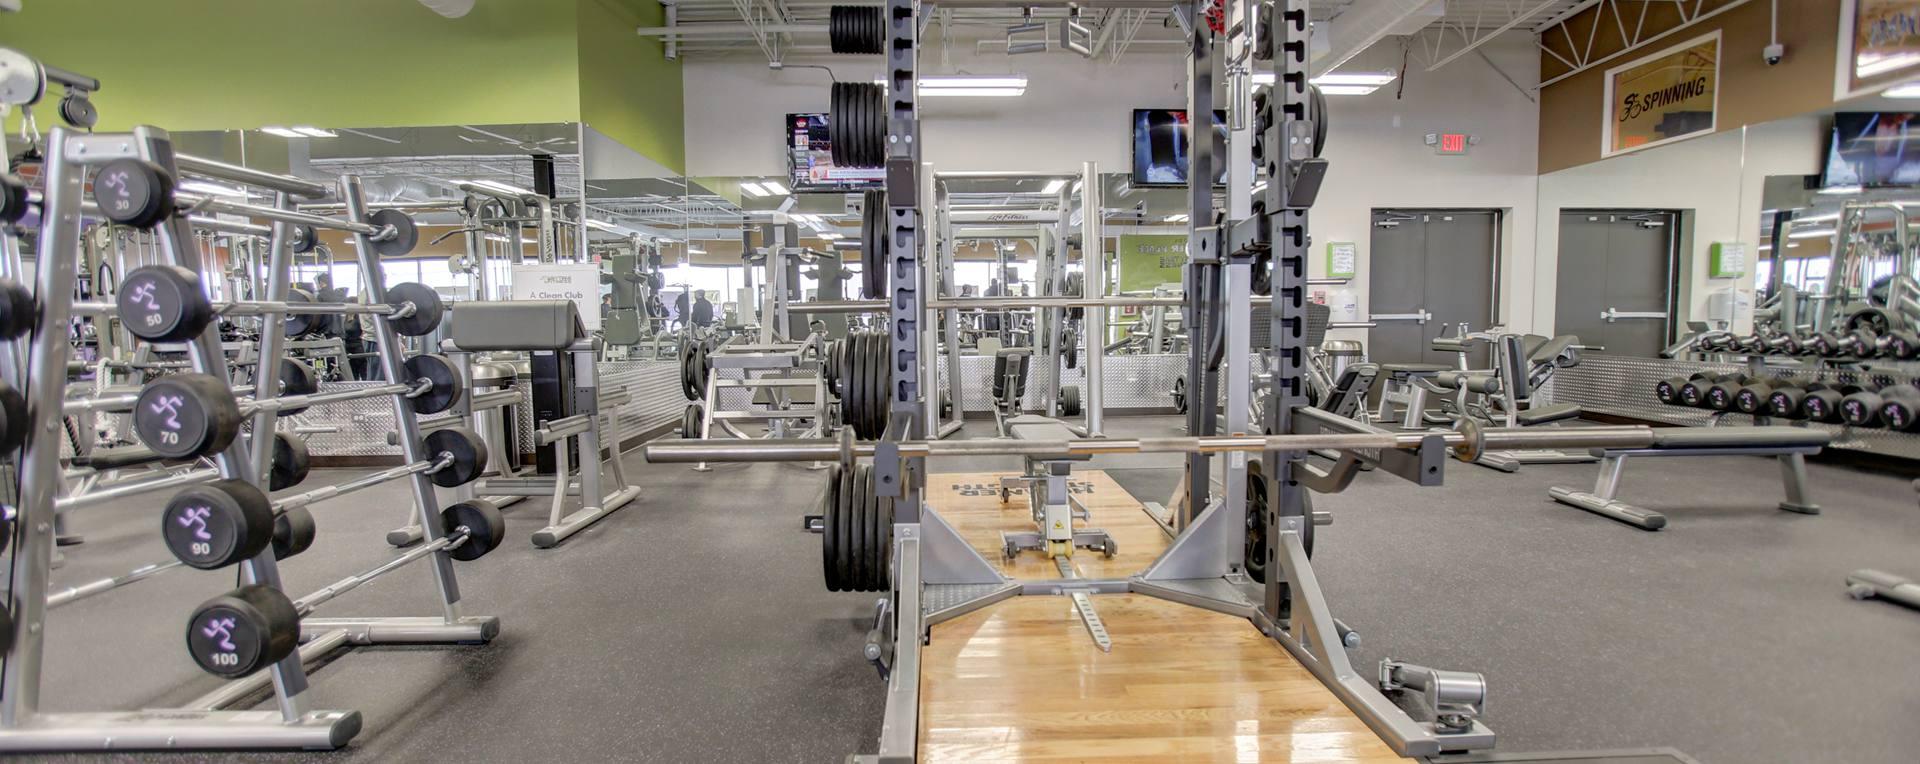 Anytime-Fitness-Downers-Grove-BenchesRacks-L.jpg